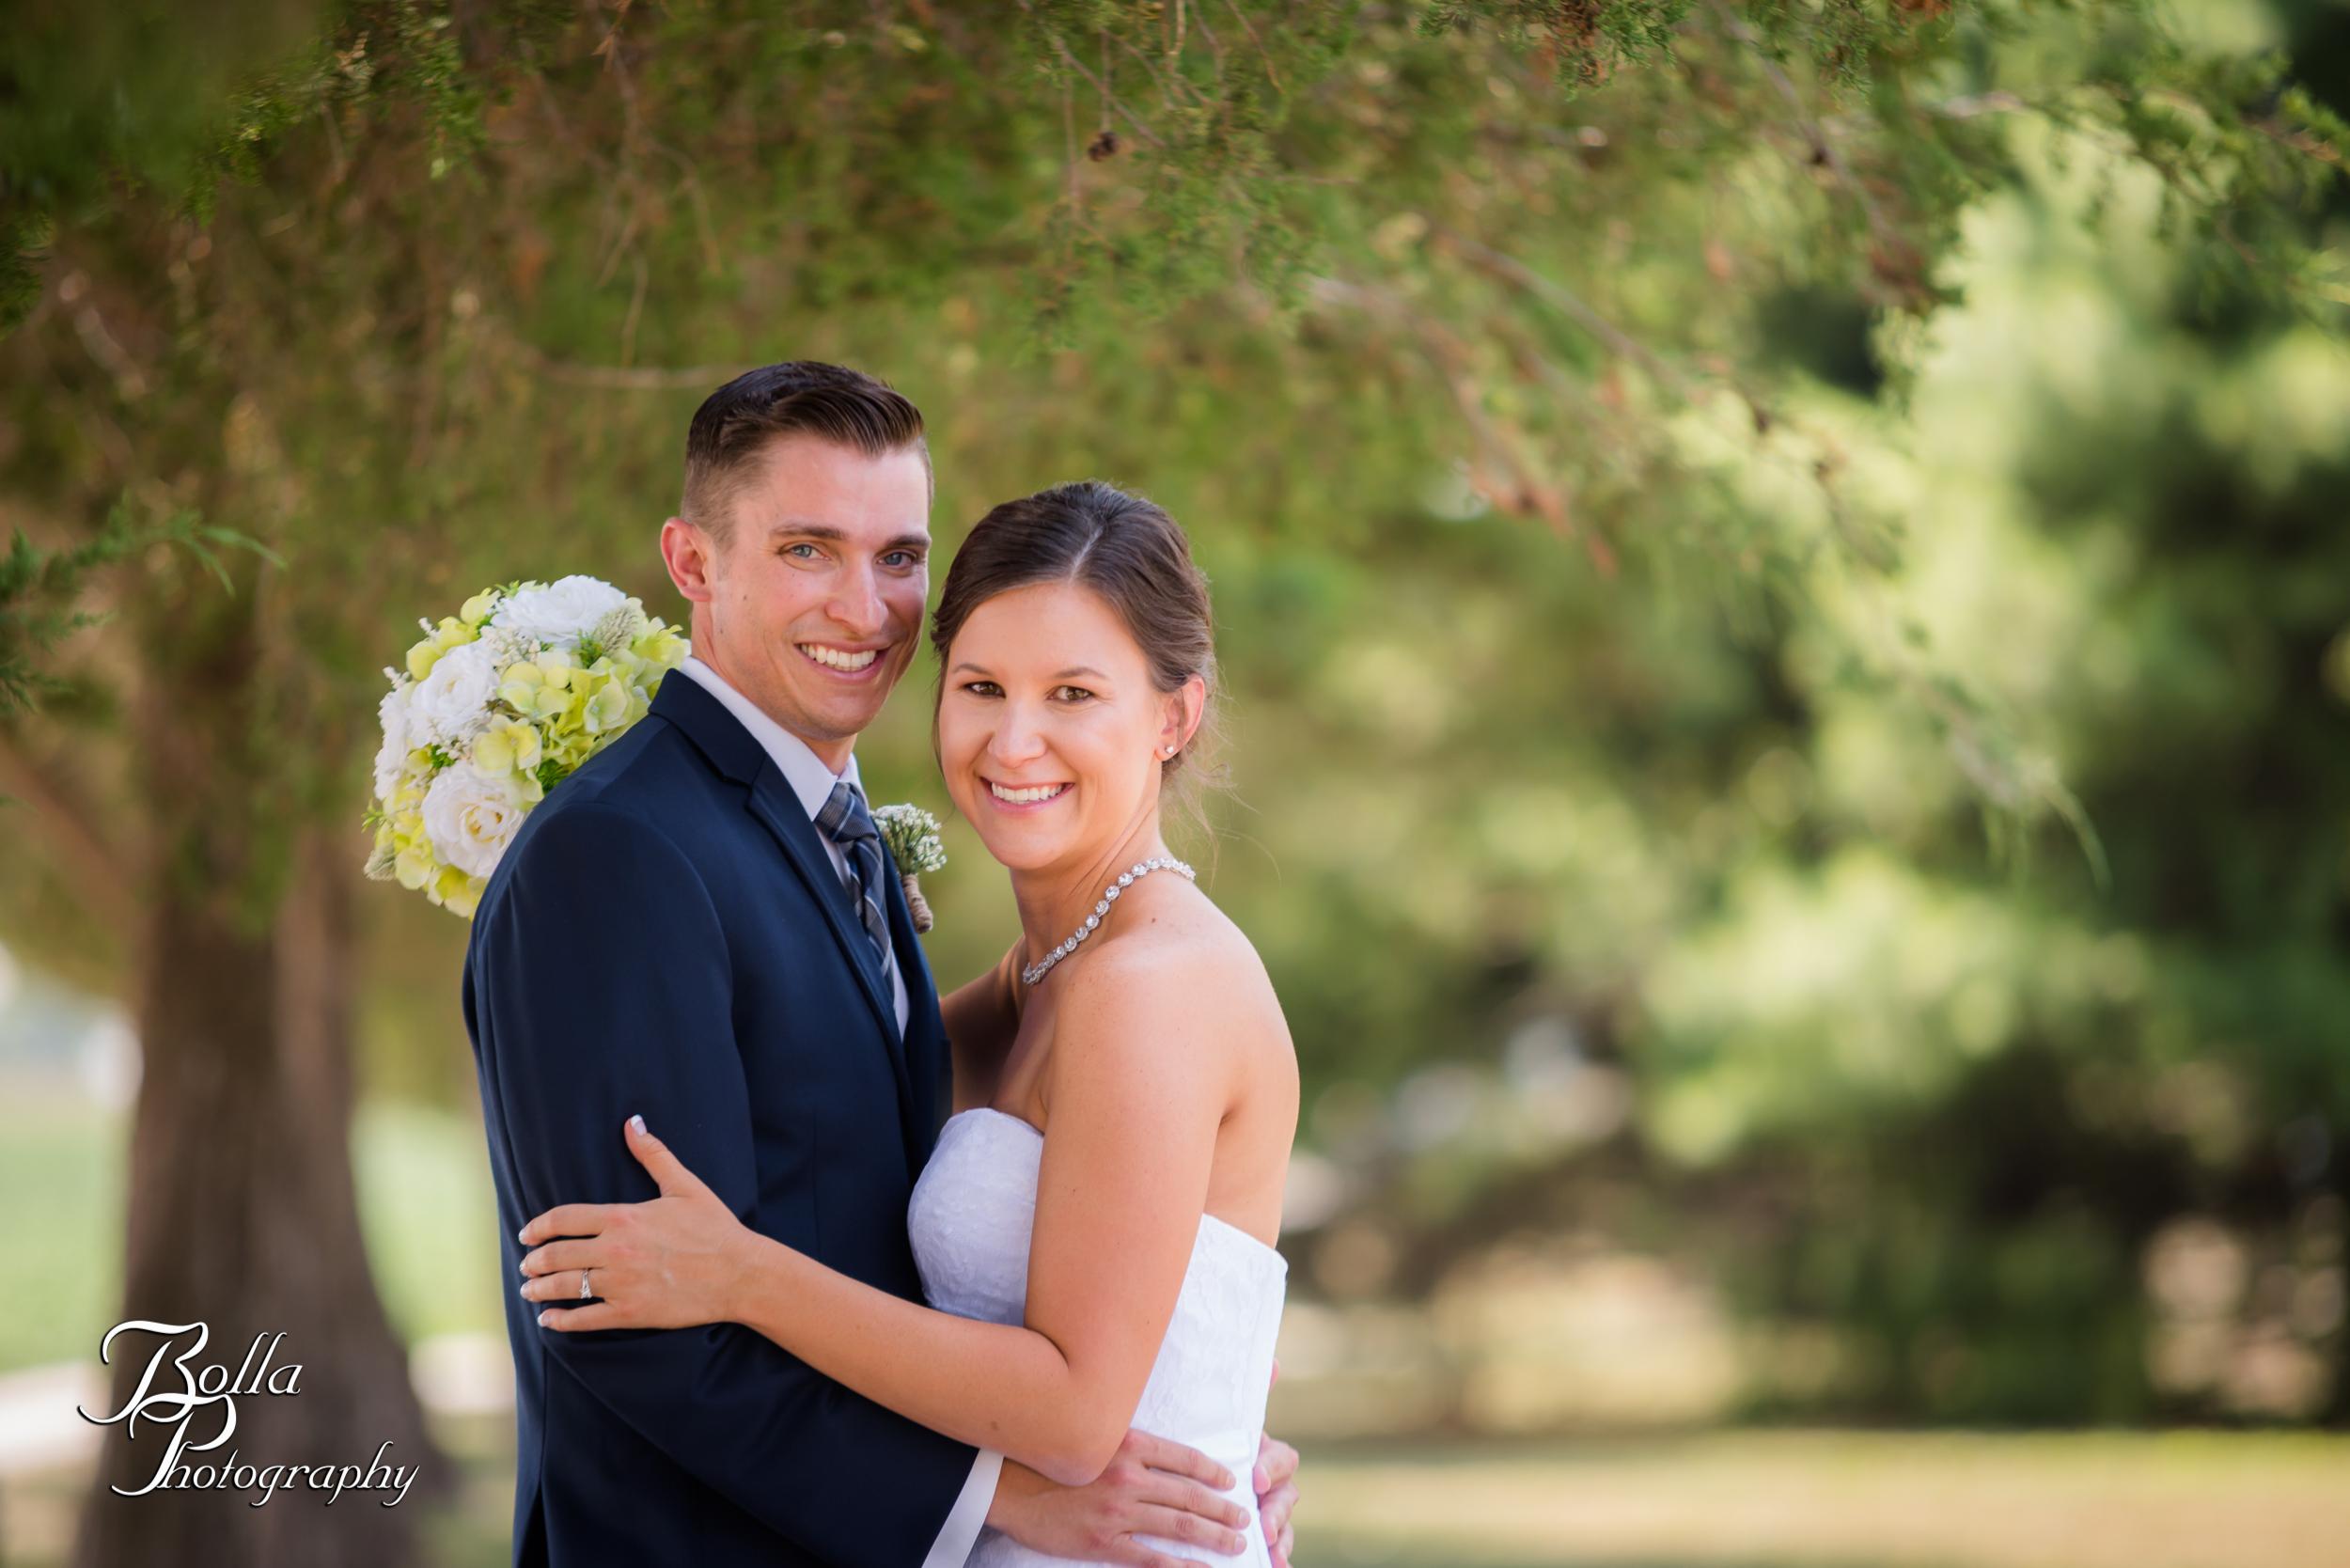 Bolla_photography_edwardsville_wedding_photographer_st_louis_weddings_Jessica_Barbachem_Dillon_Kaesberg_Waterloo_Red_Bud-0001.jpg